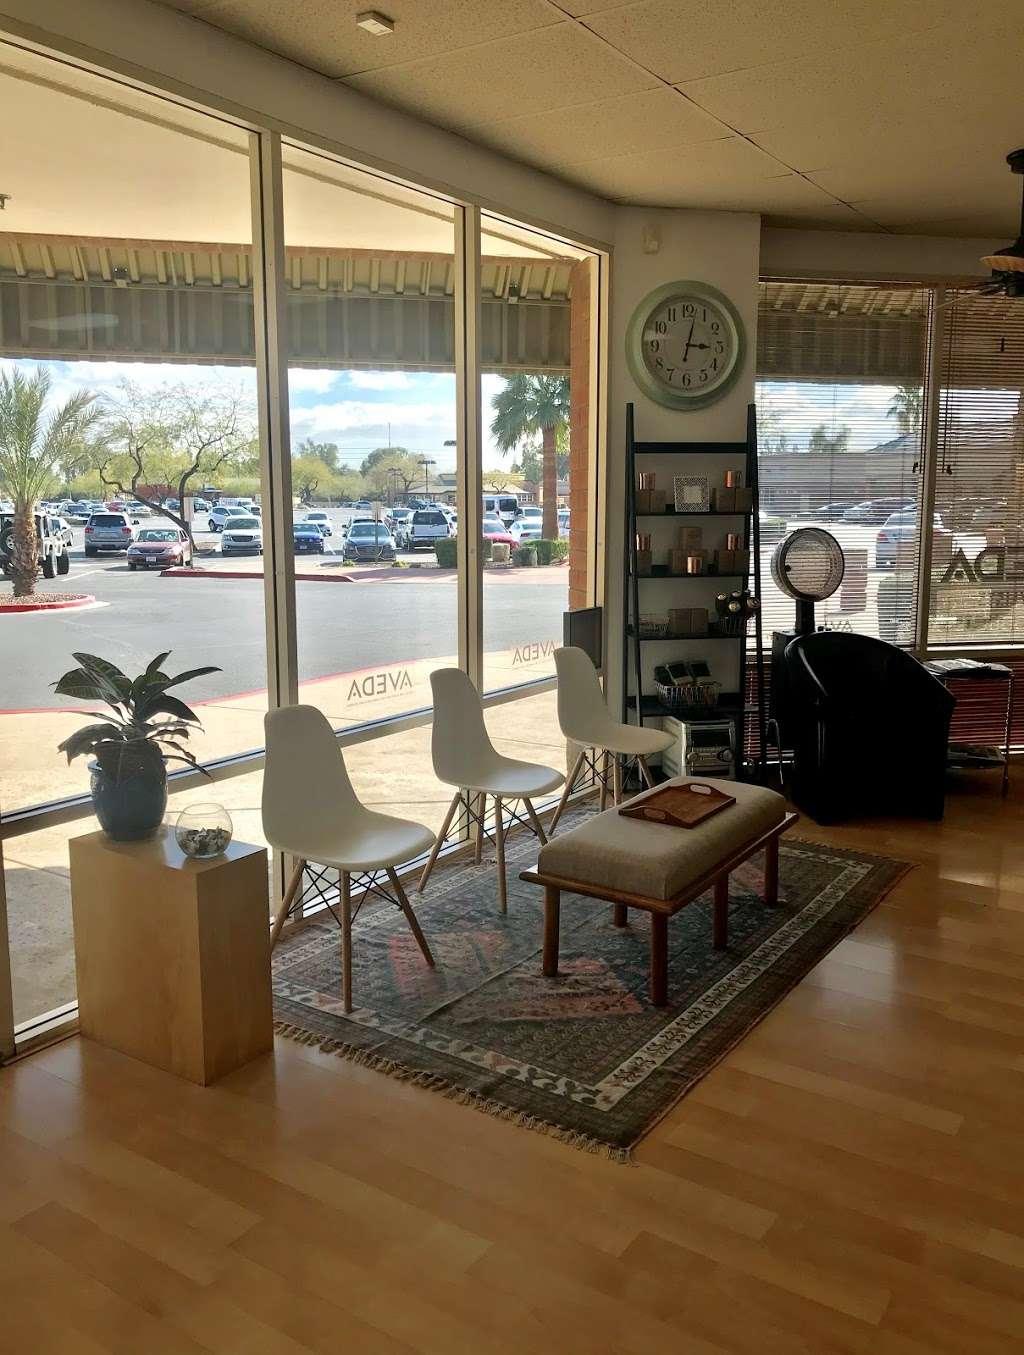 Waters + Co Salon - hair care  | Photo 10 of 10 | Address: 8664 E Shea Blvd Ste 158, Scottsdale, AZ 85260, USA | Phone: (480) 970-1711